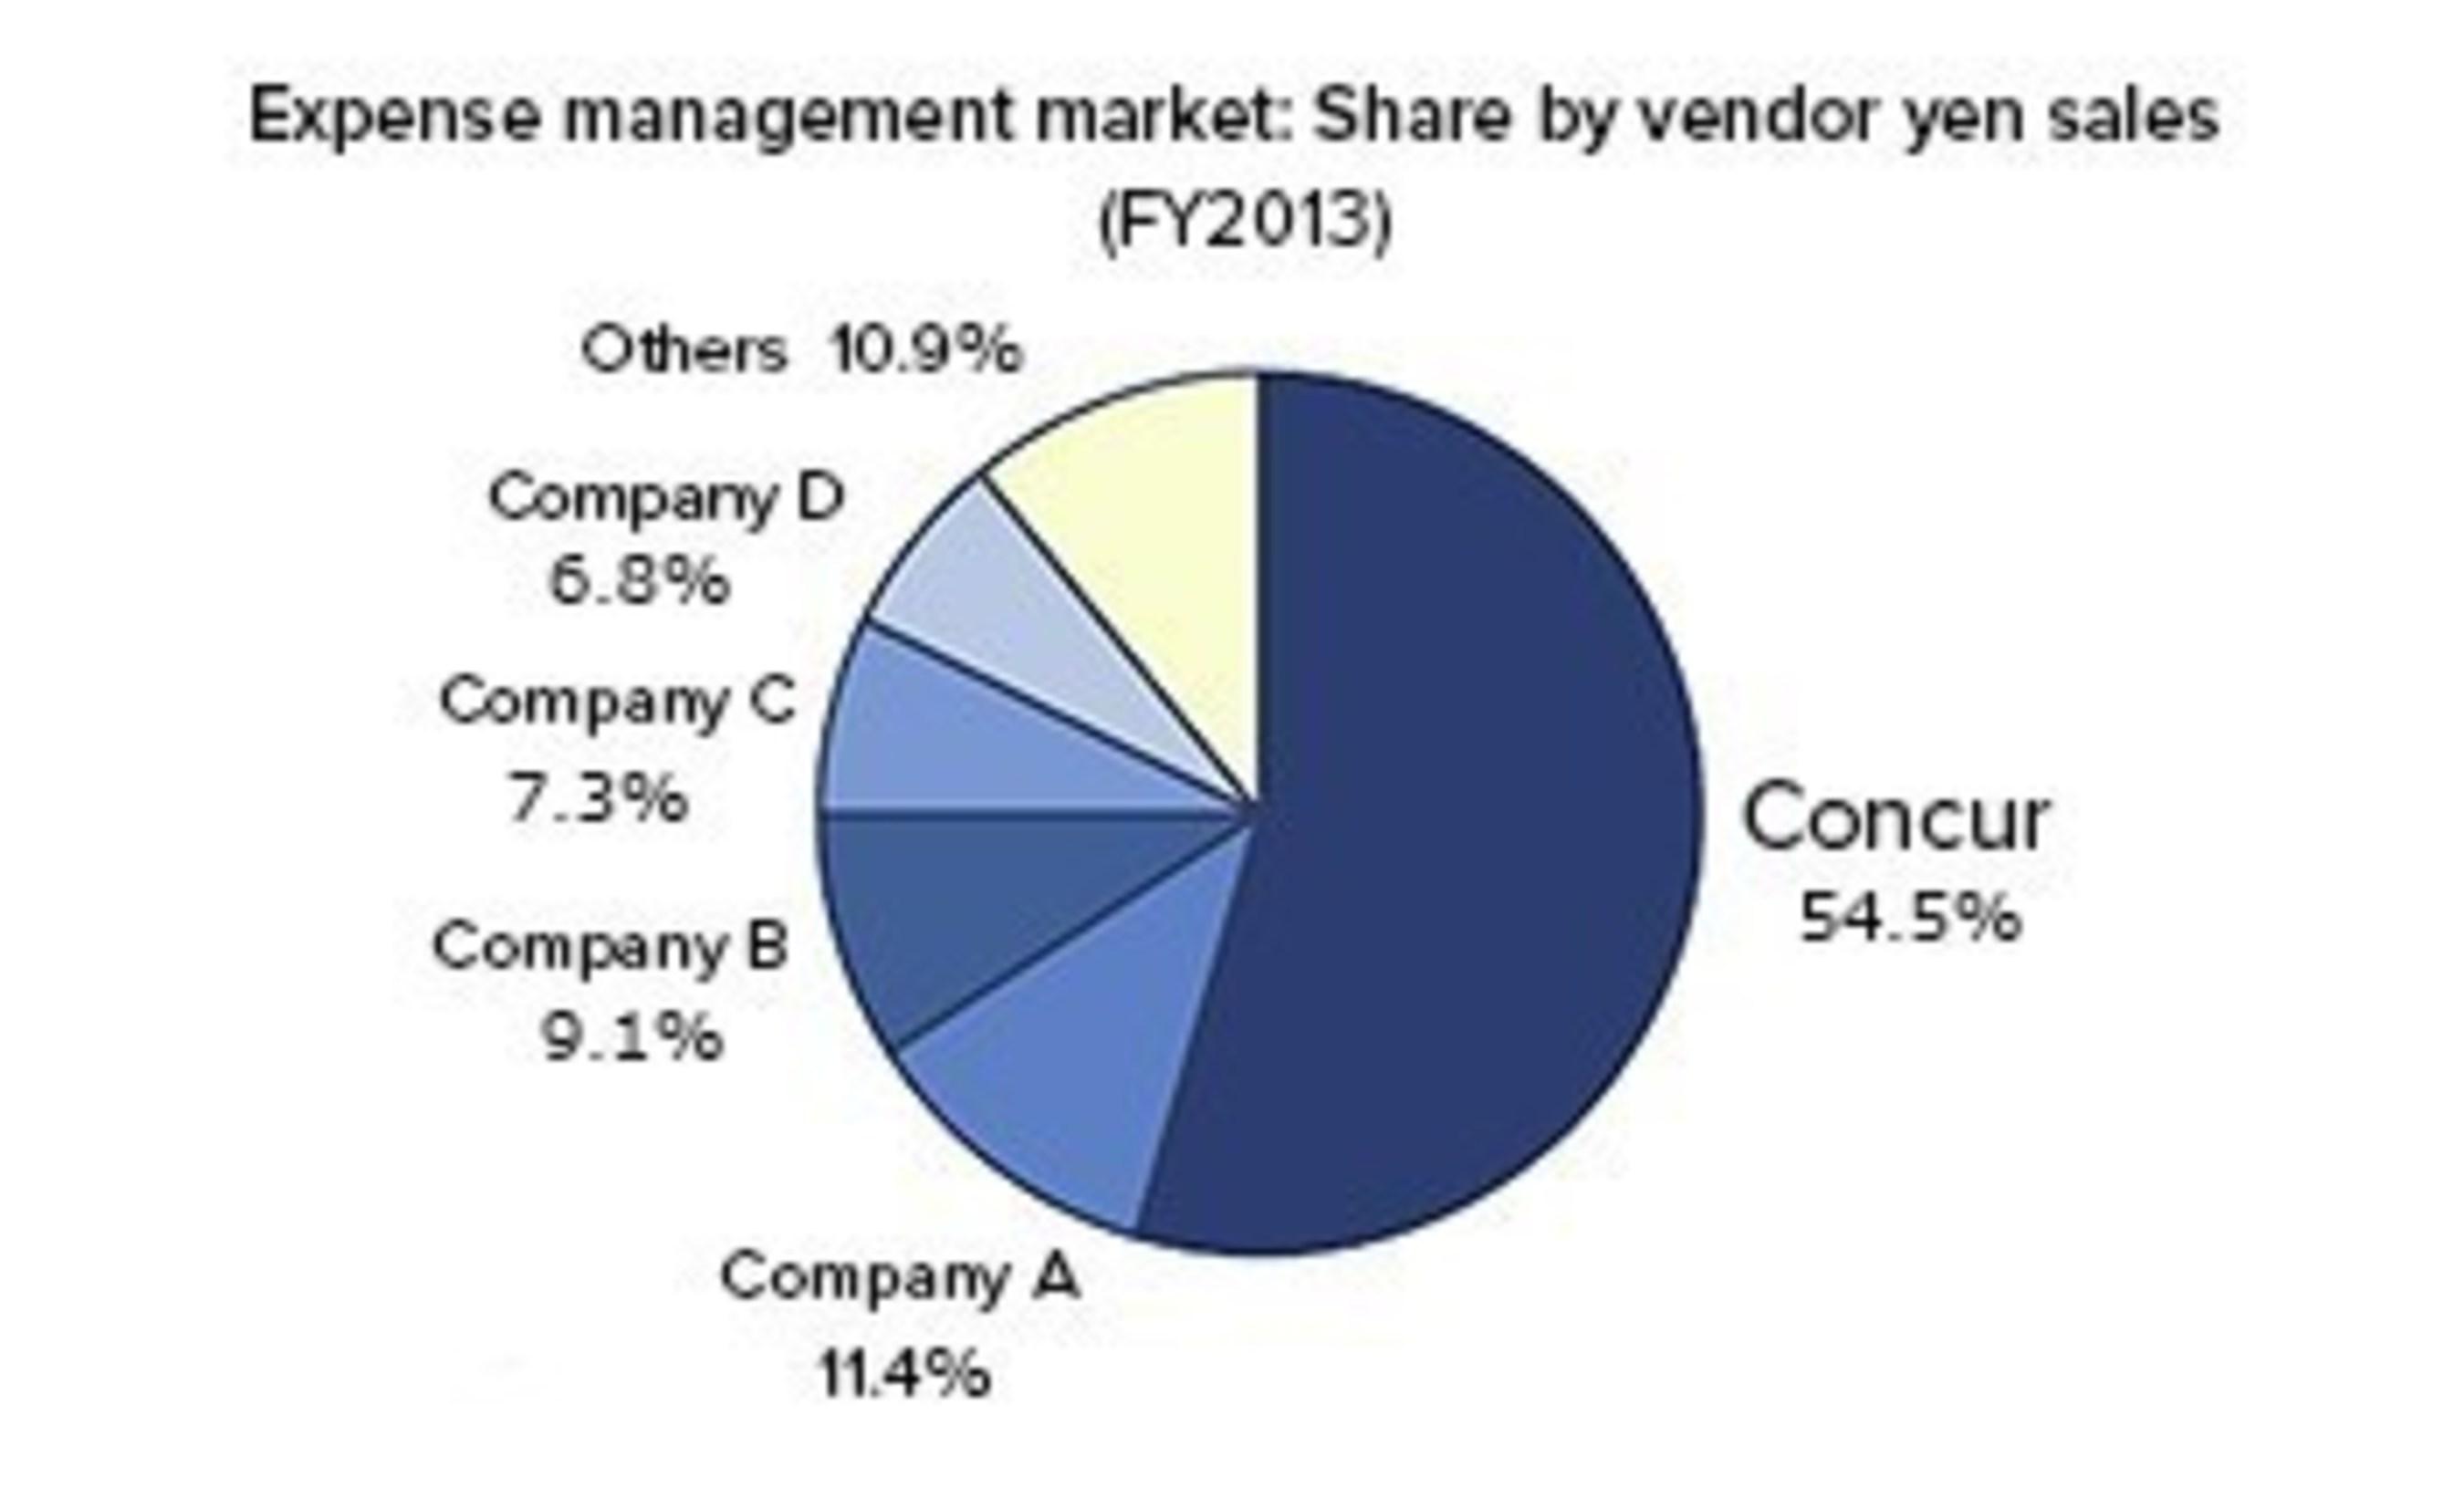 Source: ITR Market View: ERP Market 2015 (Japanese Expense Settlement Market Trends), ITR